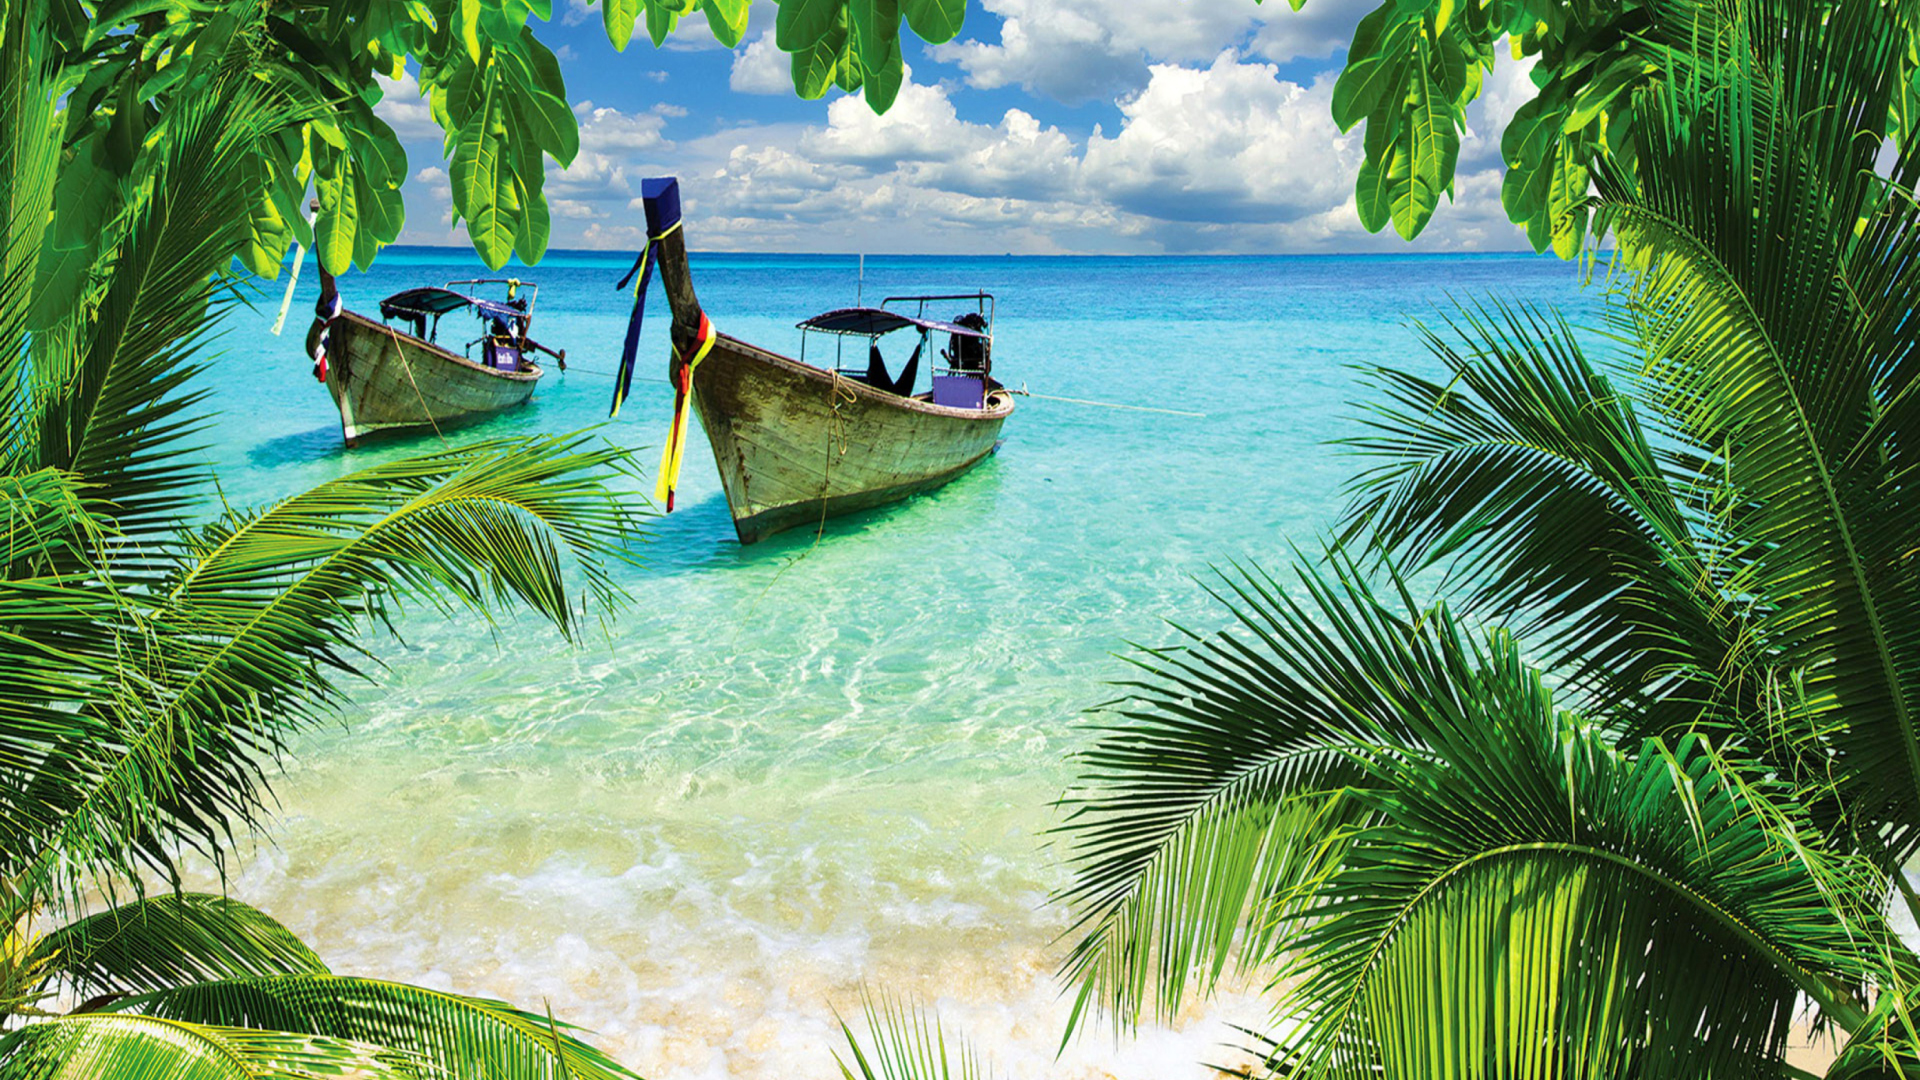 Tropical beach in curacao sfondi gratuiti per desktop for Immagini 1920x1080